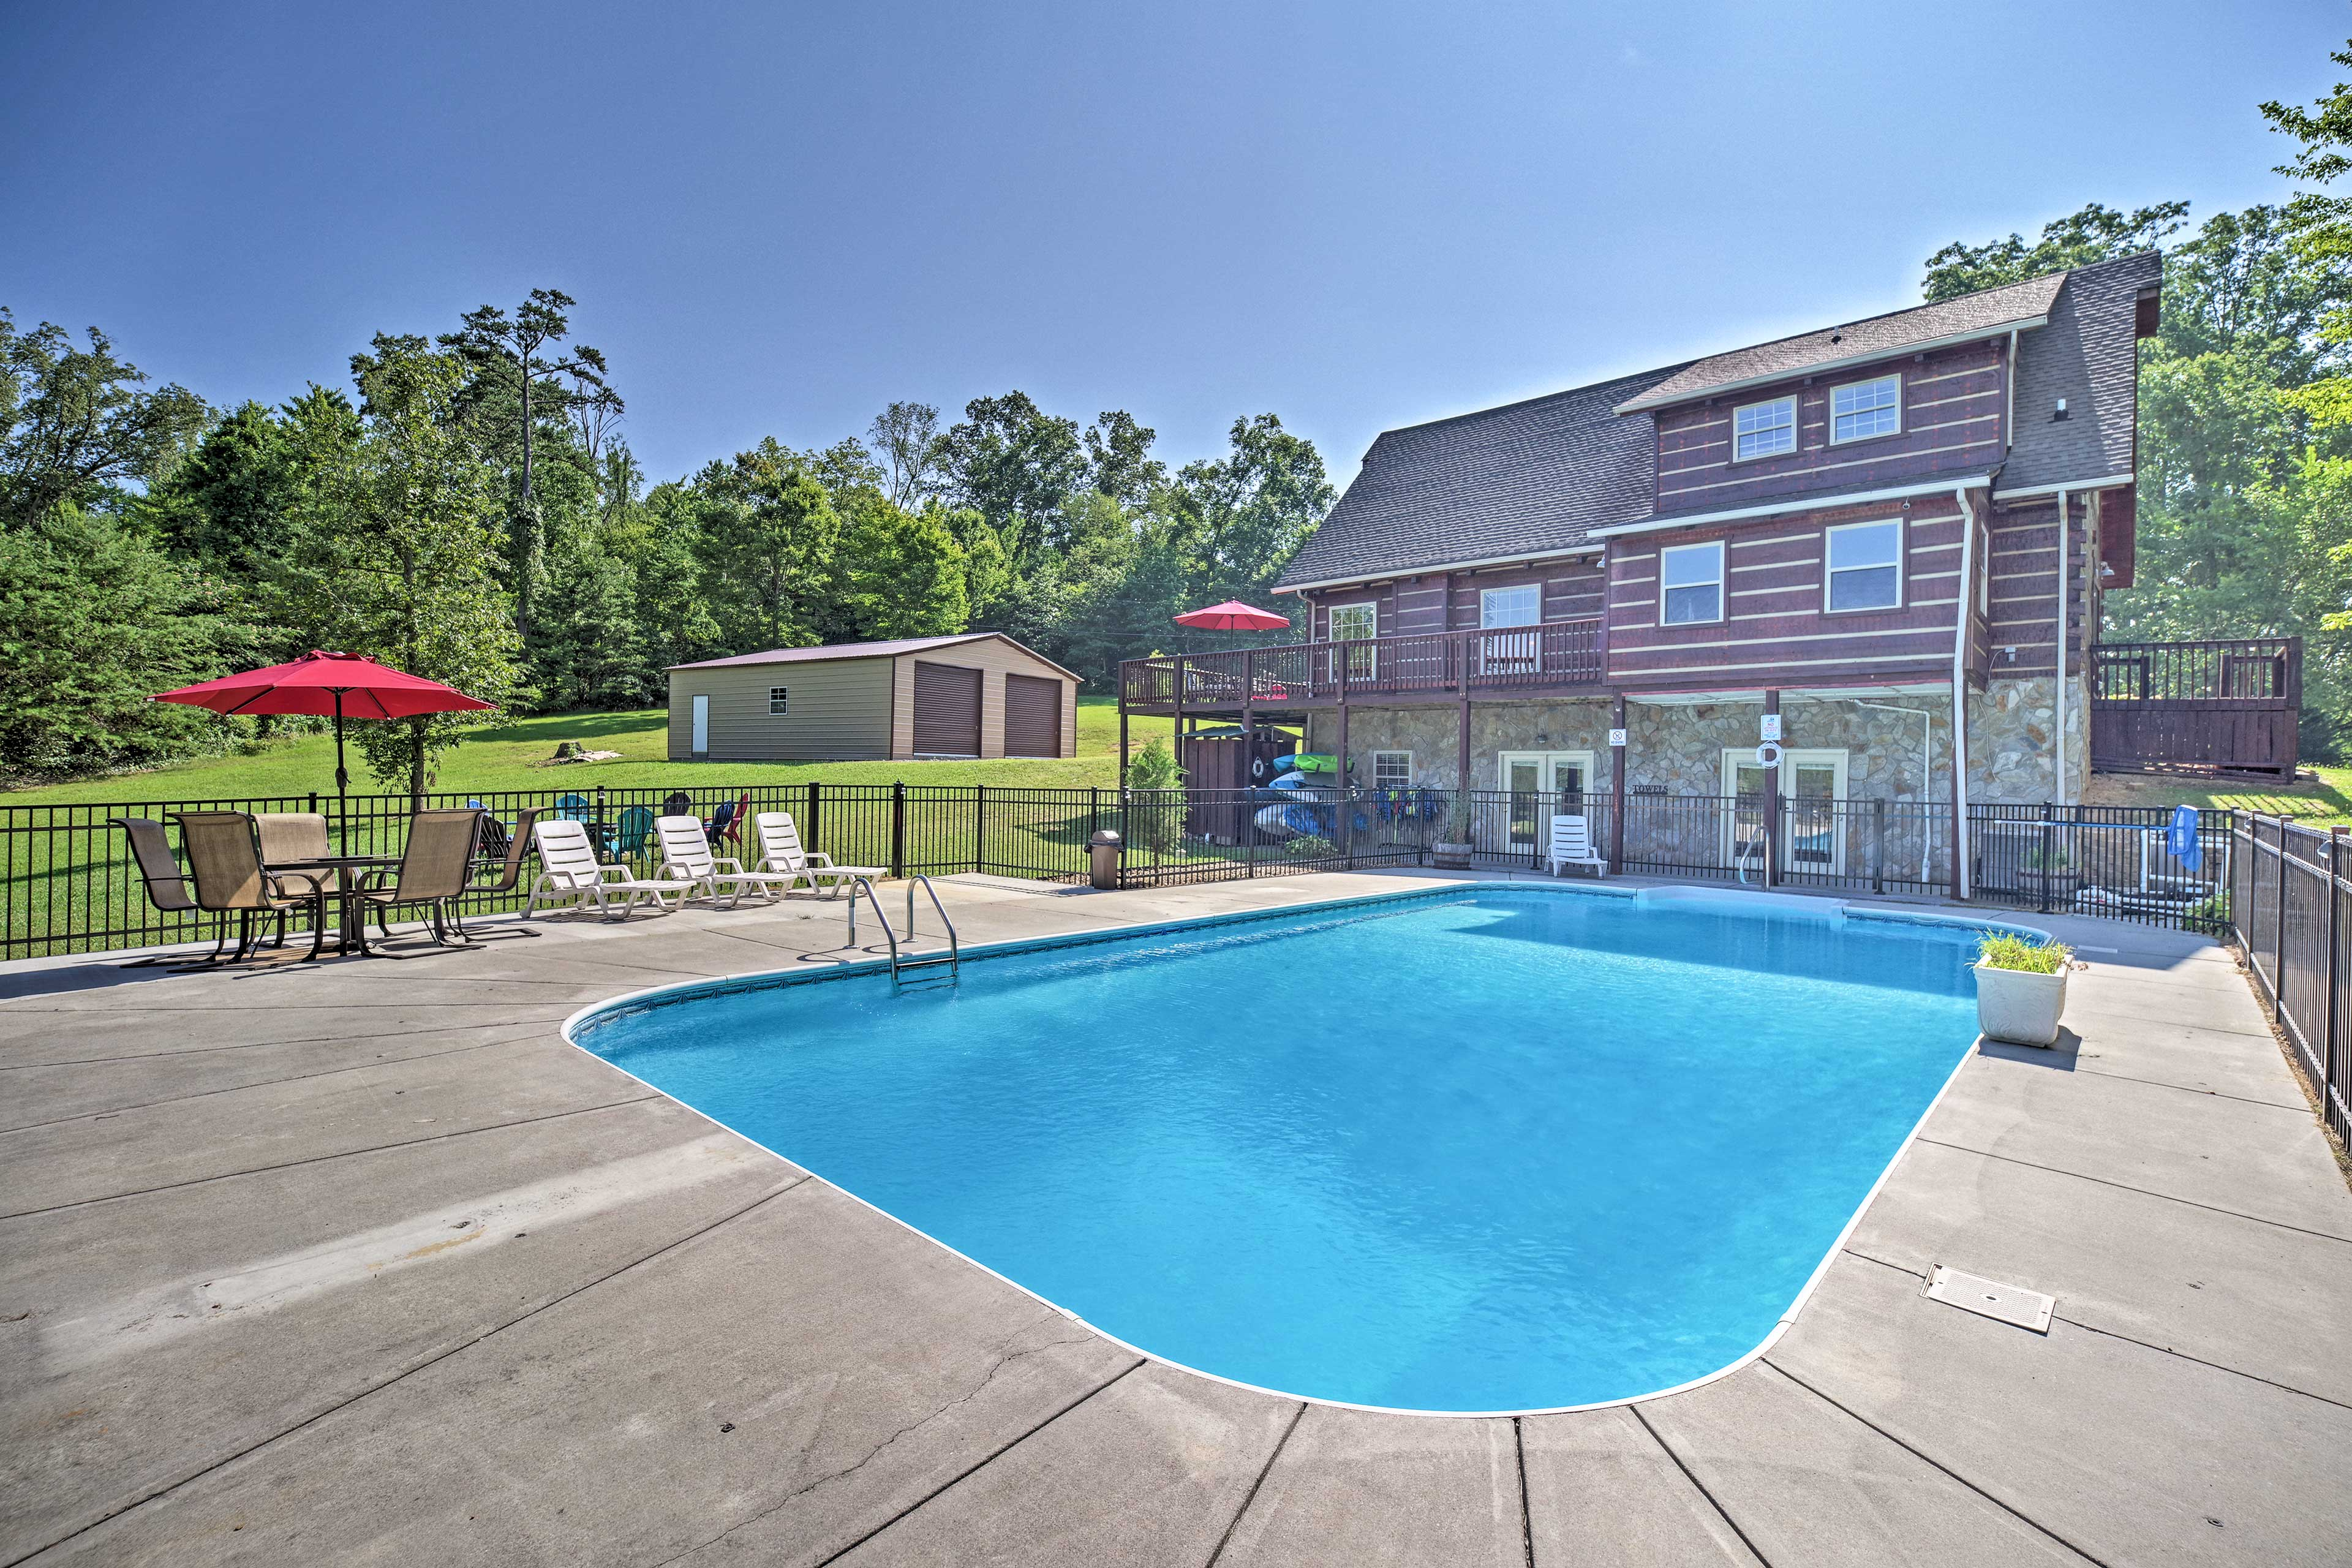 The 4-bedroom, 3.5-bath vacation rental sleeps 12 & has a private seasonal pool.